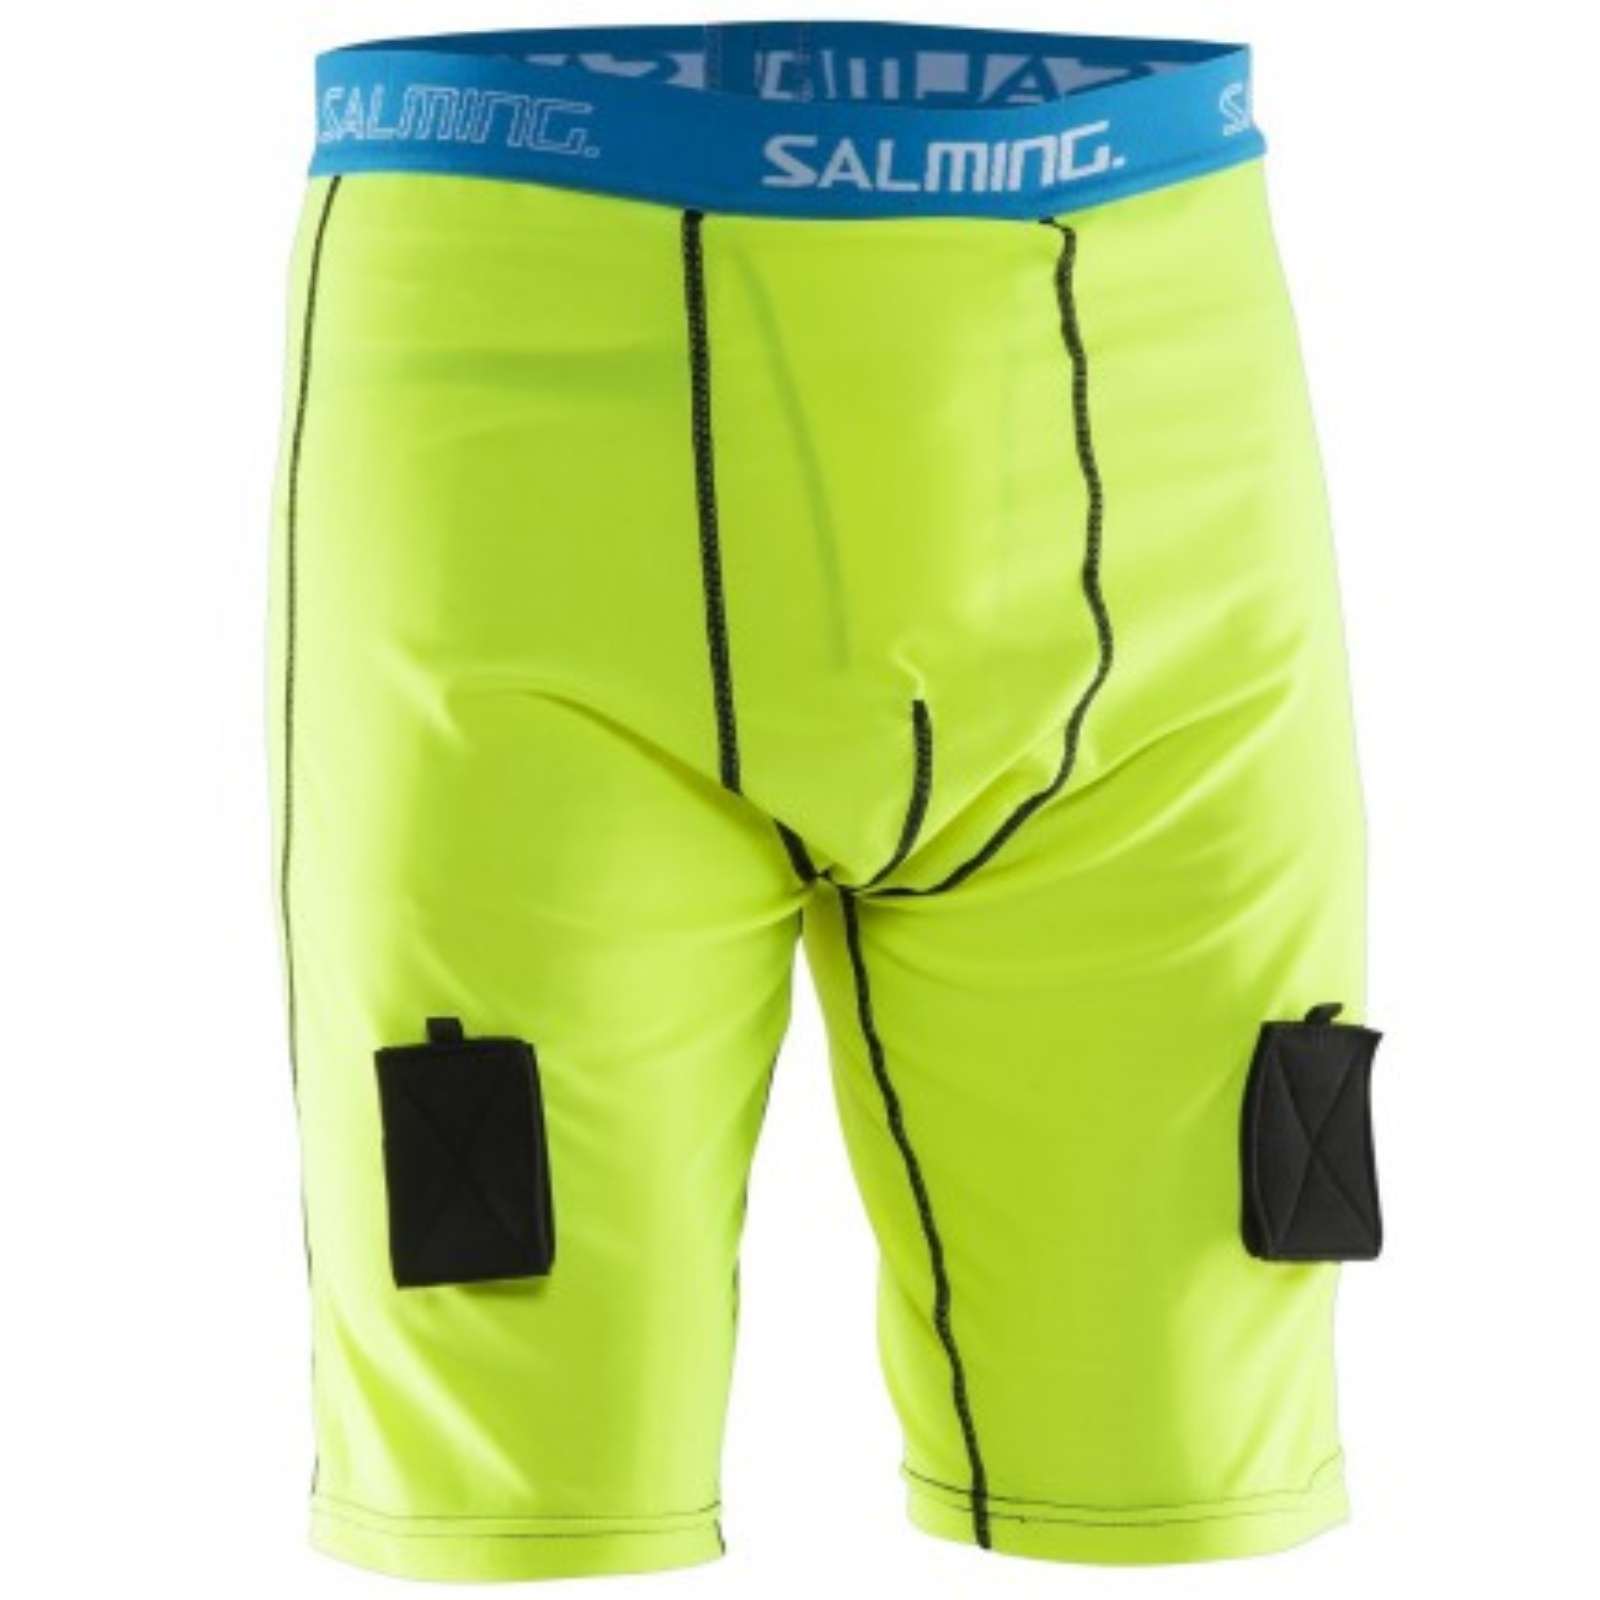 Hokejové šortky SALMING Comp Jock Short Pant vel. XXL